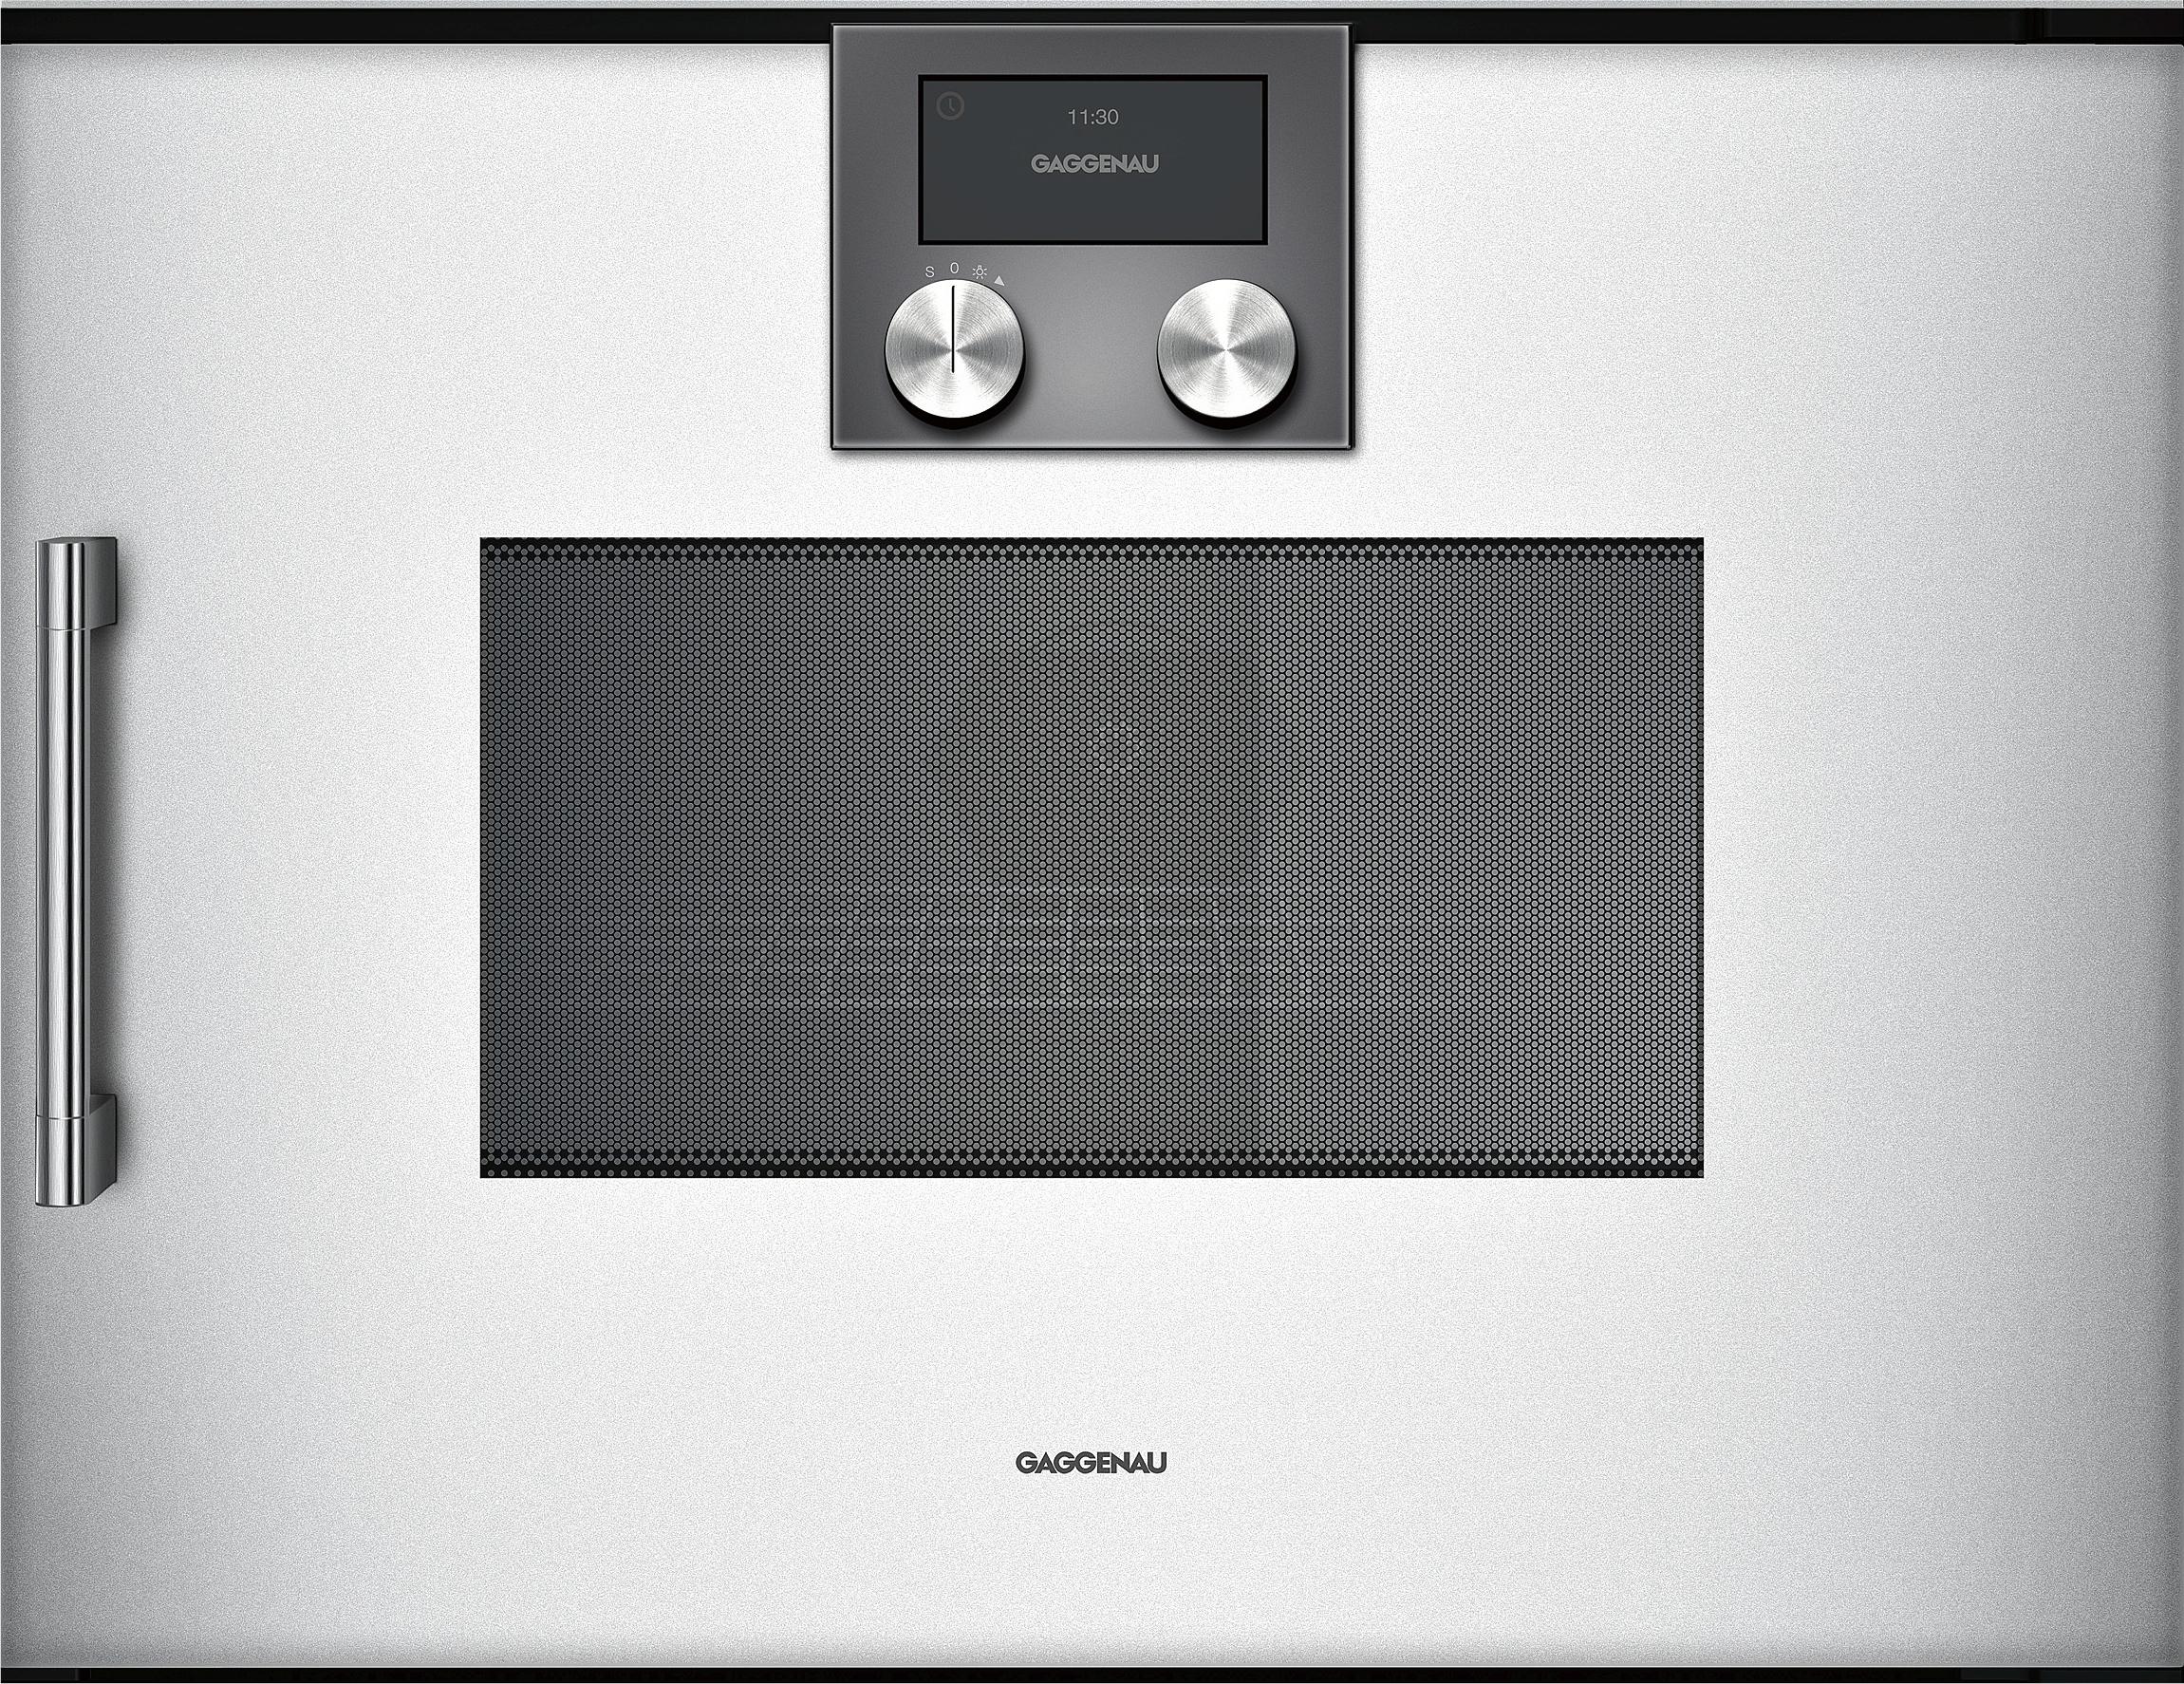 gaggenau bmp250130 mikrowellen backofen serie 200 vollglast r in gaggenau silber breite 60 cm. Black Bedroom Furniture Sets. Home Design Ideas